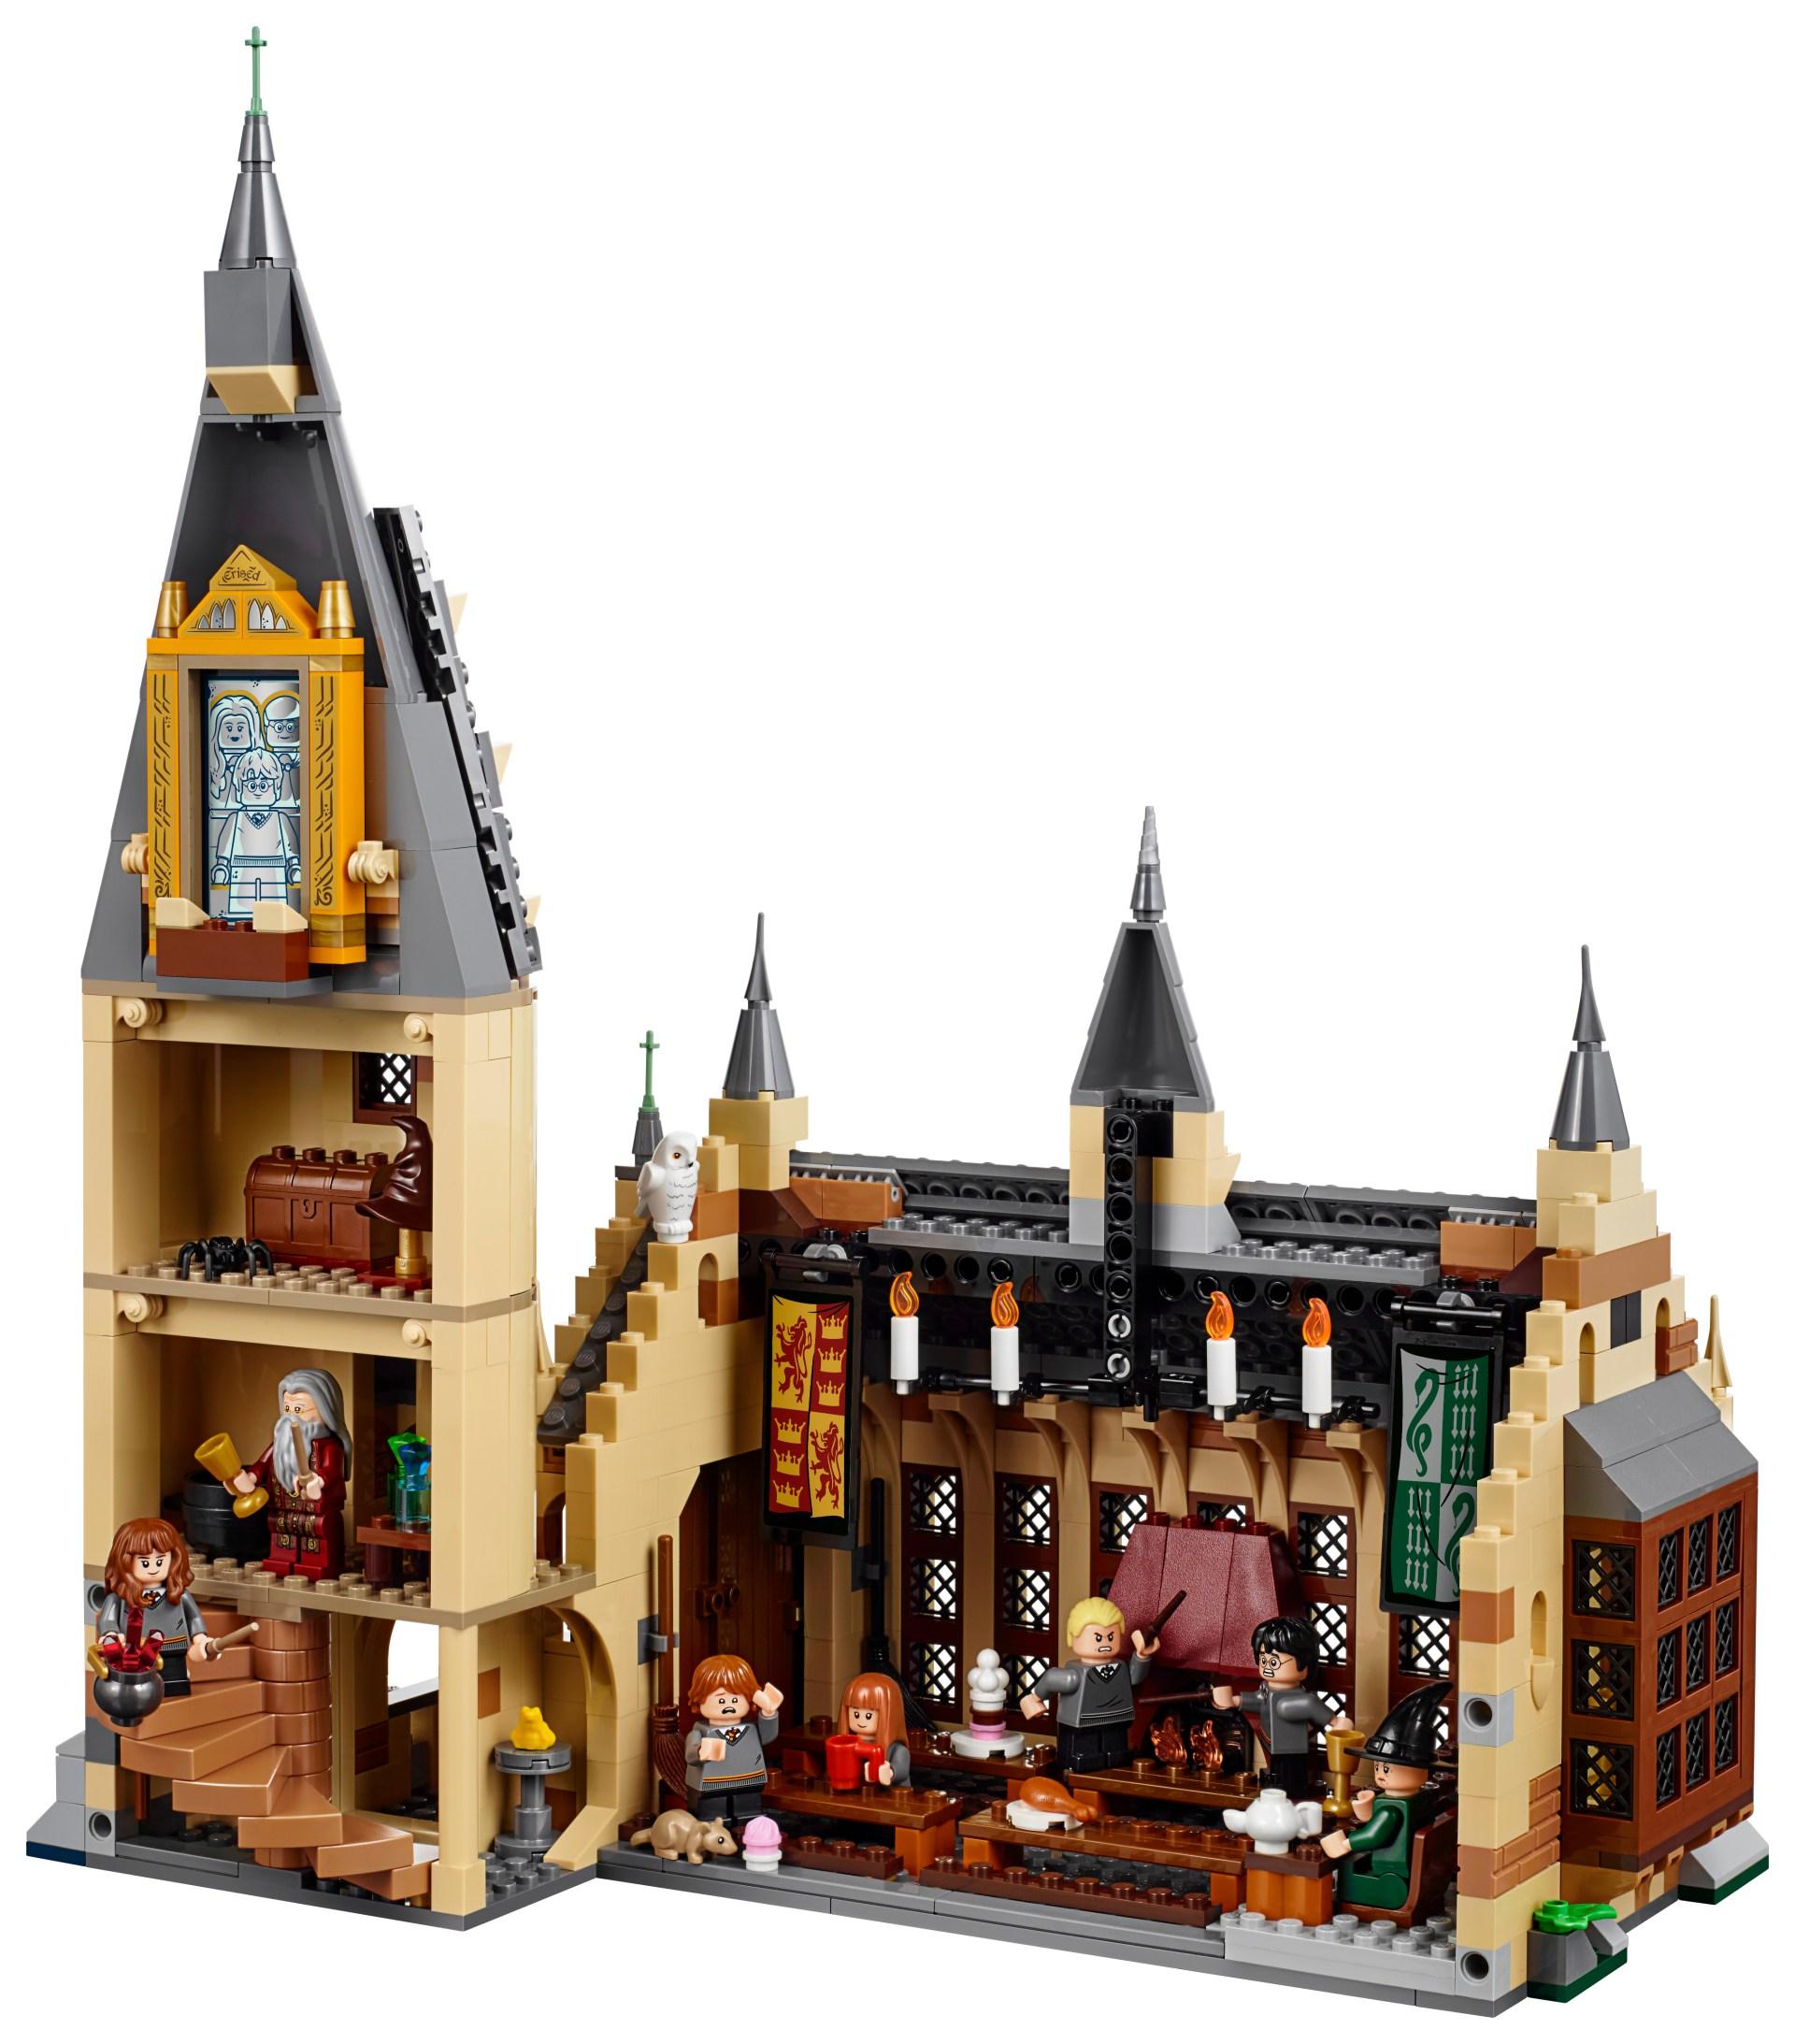 Photo_02_LEGO-Harry-Potter-75954-Hogwarts-Great-Hall-Set-Interior.jpg